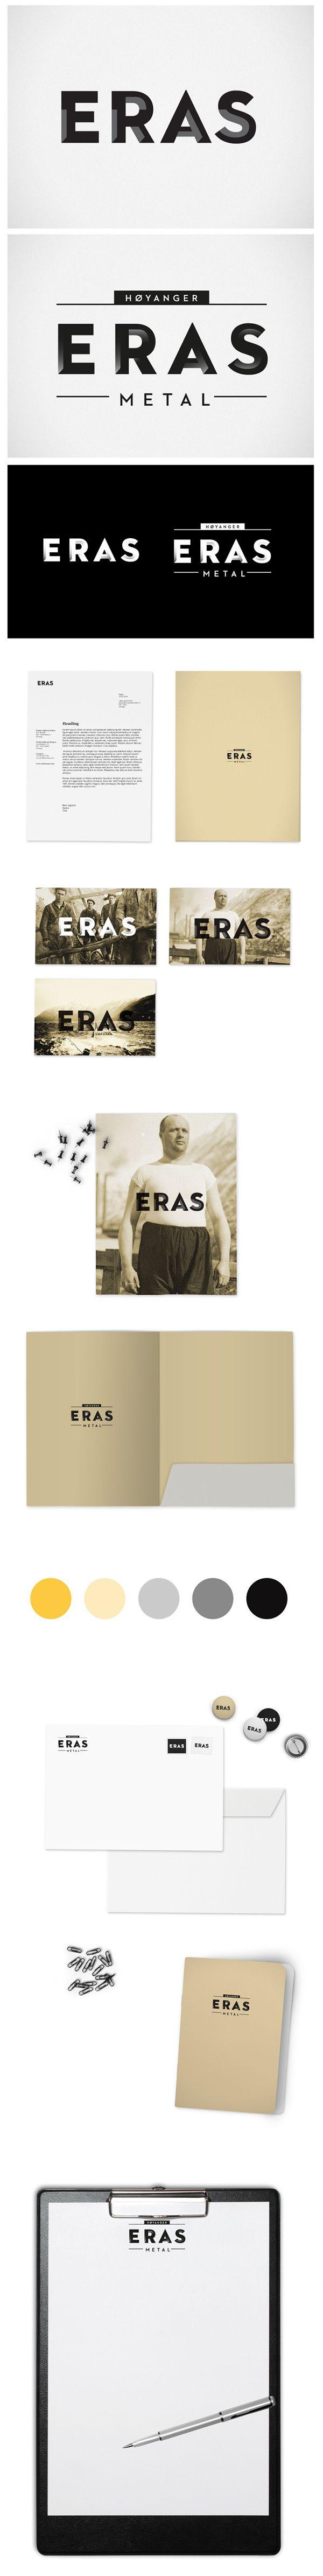 Eras by Oh Yeah Studio, via Behance